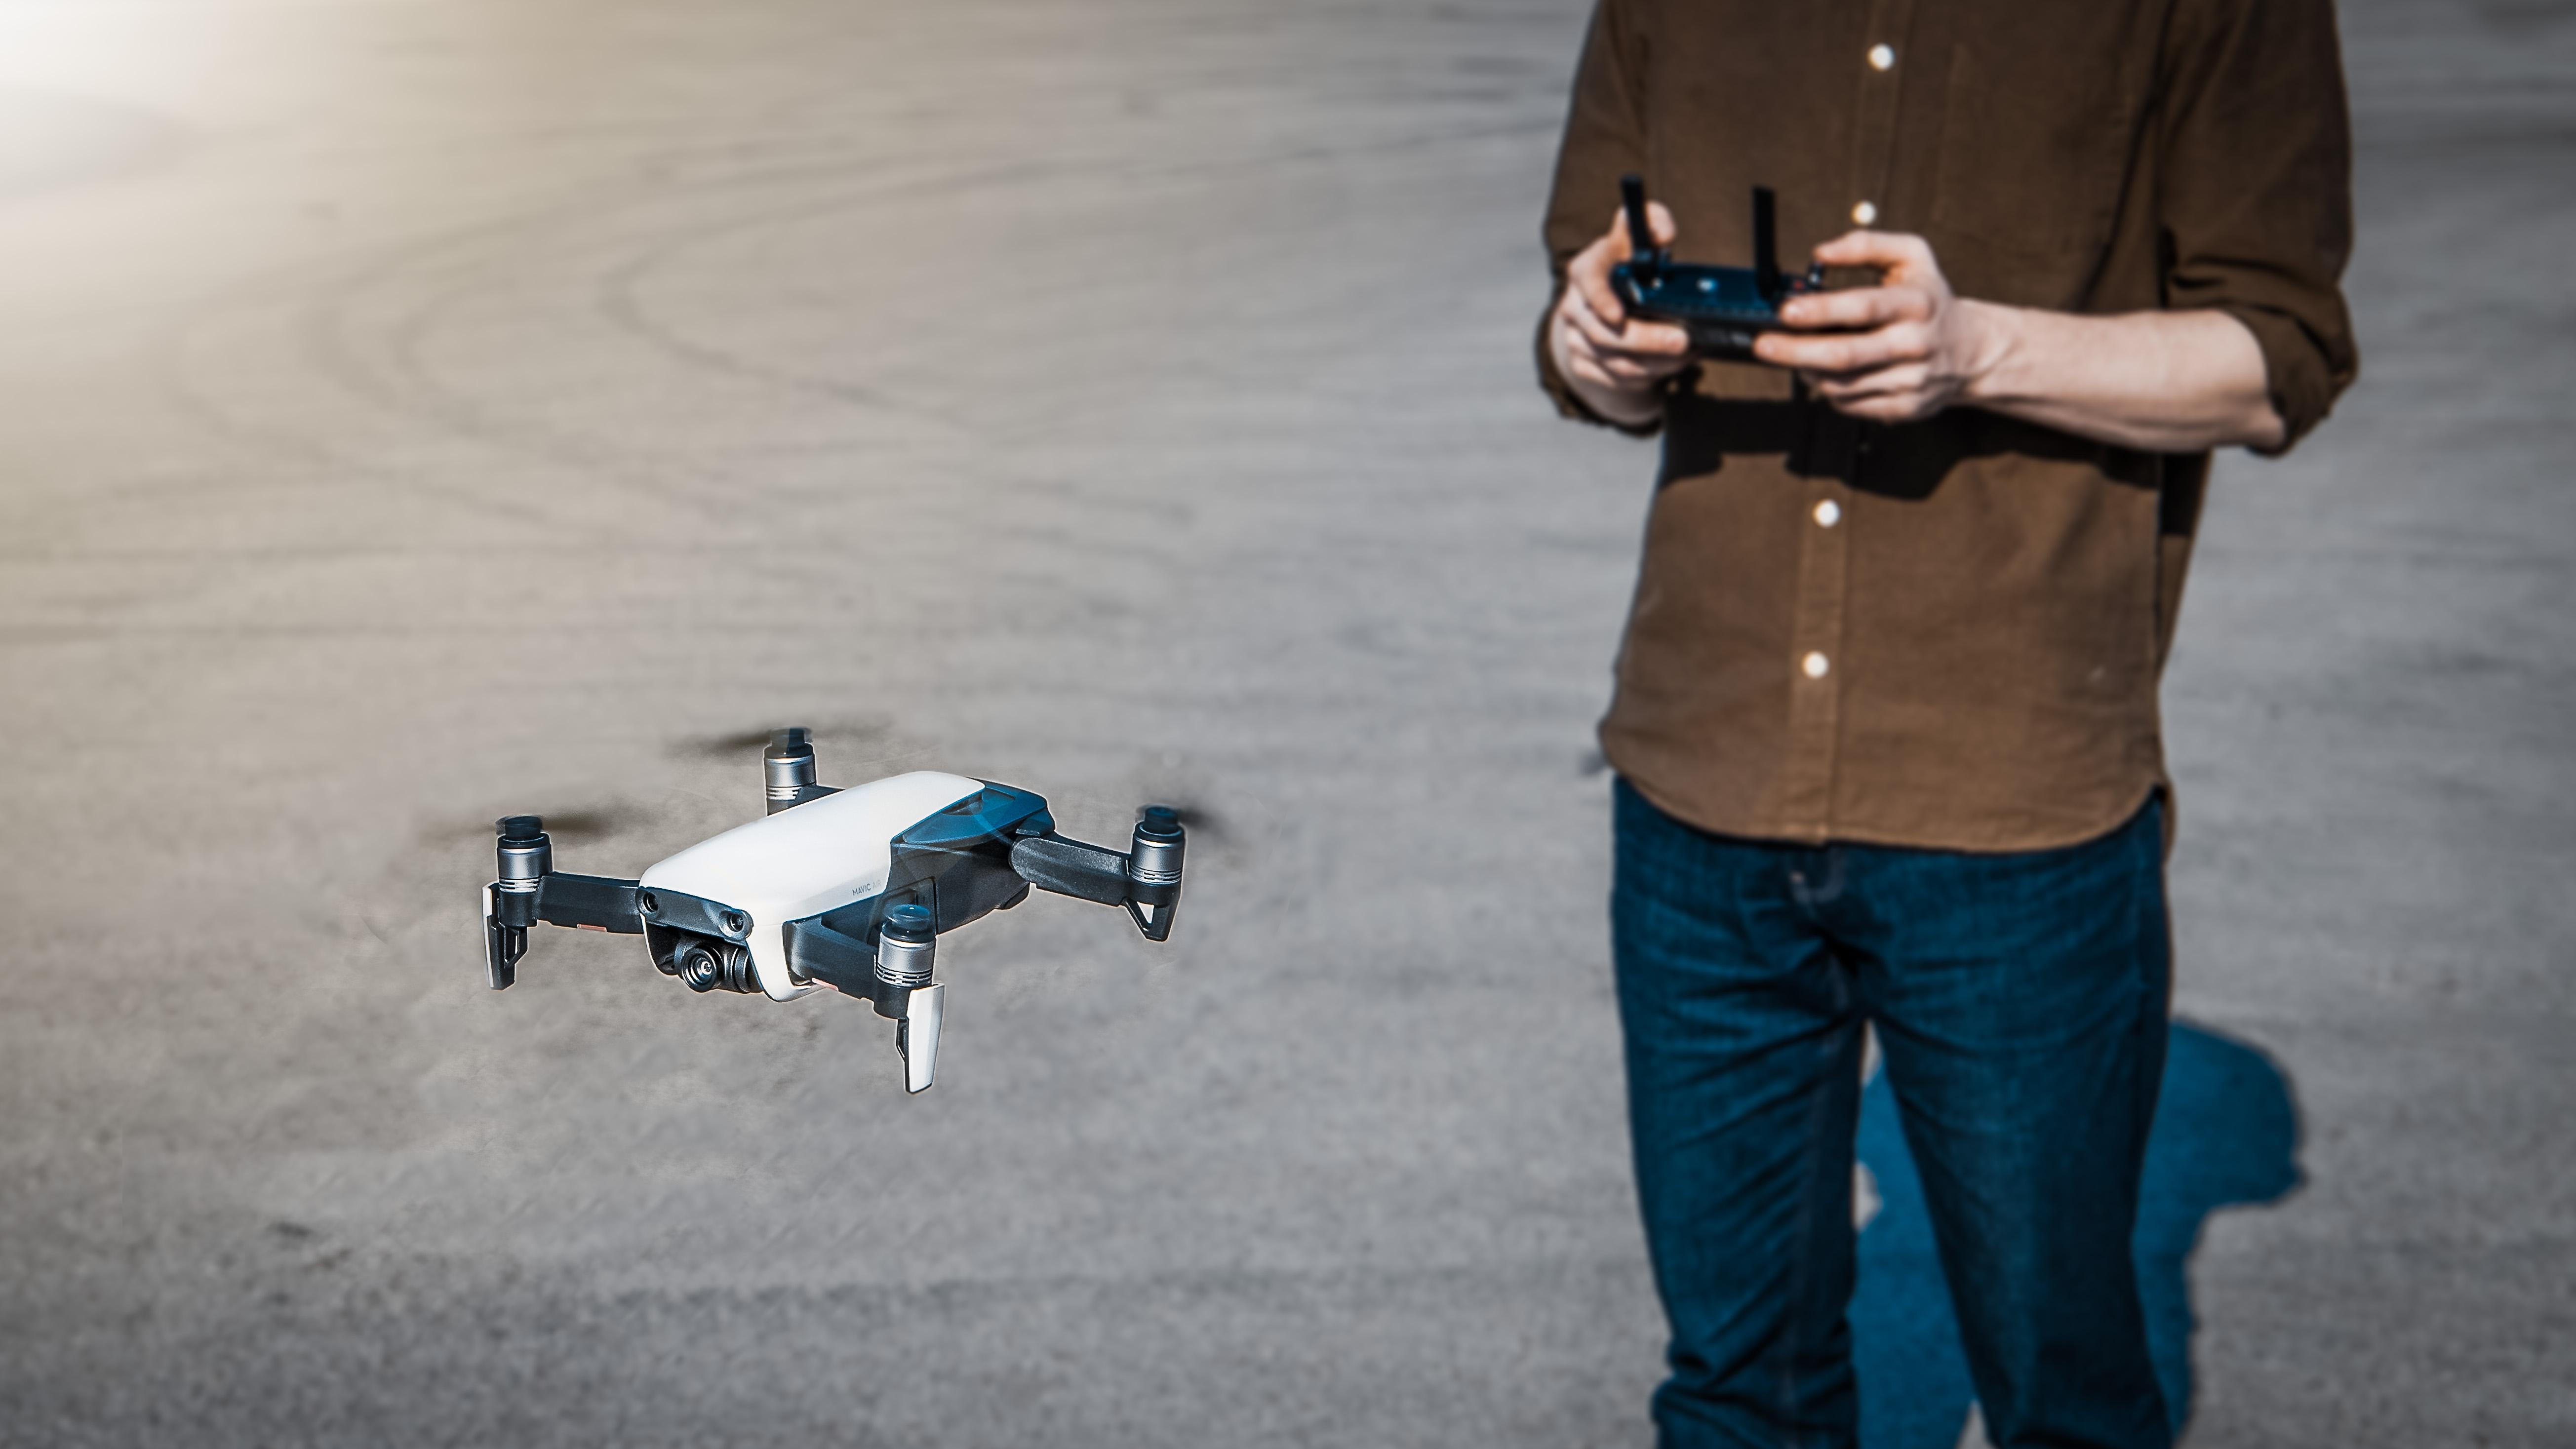 Karbist välja: DJI Mavic Air droon